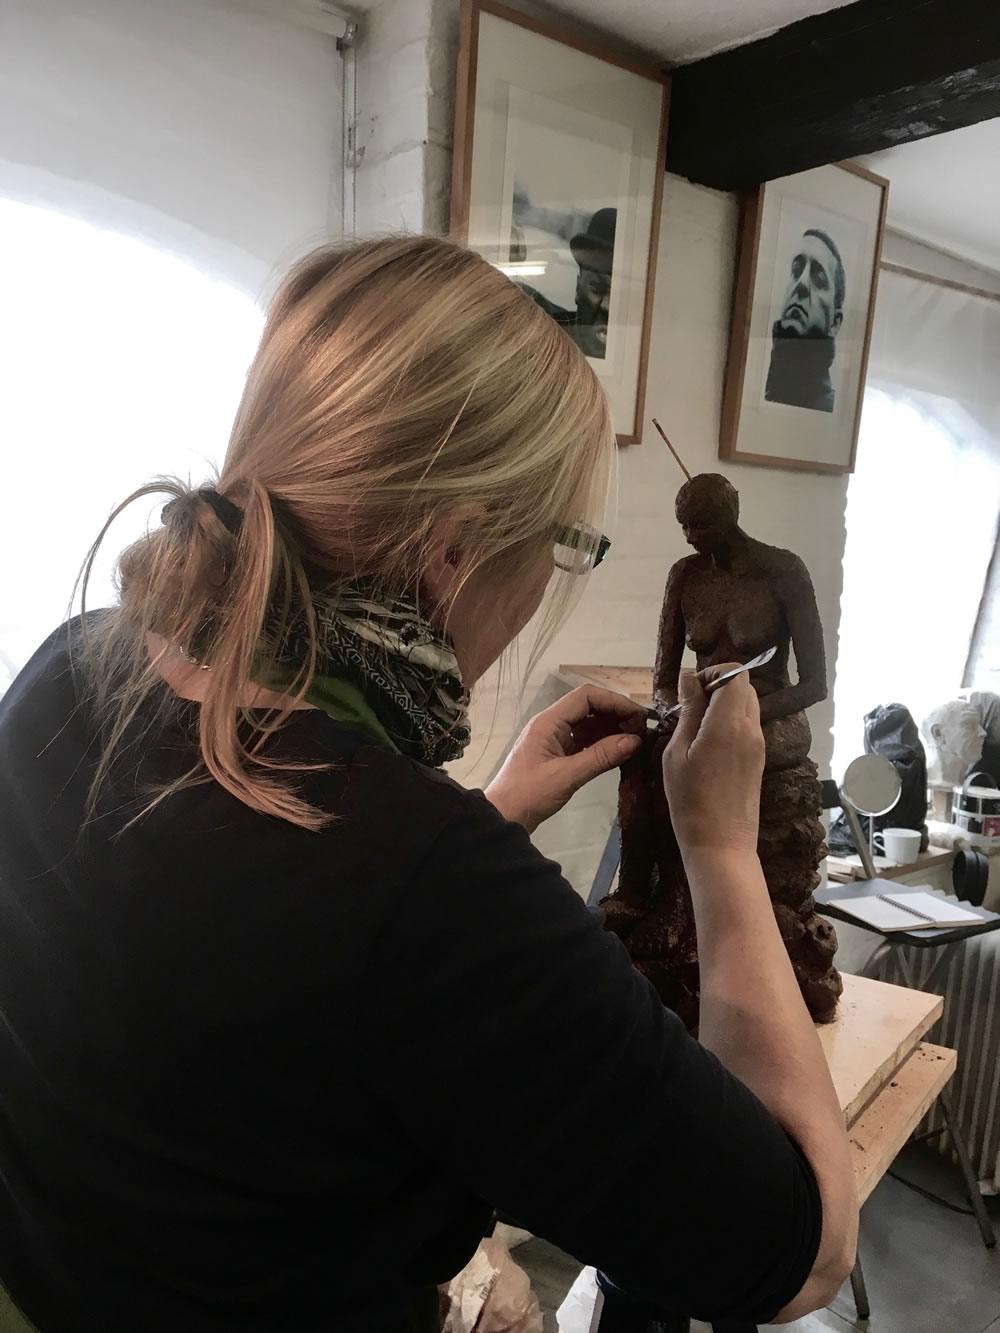 2017.04.28 Photo of Debs Sculpting